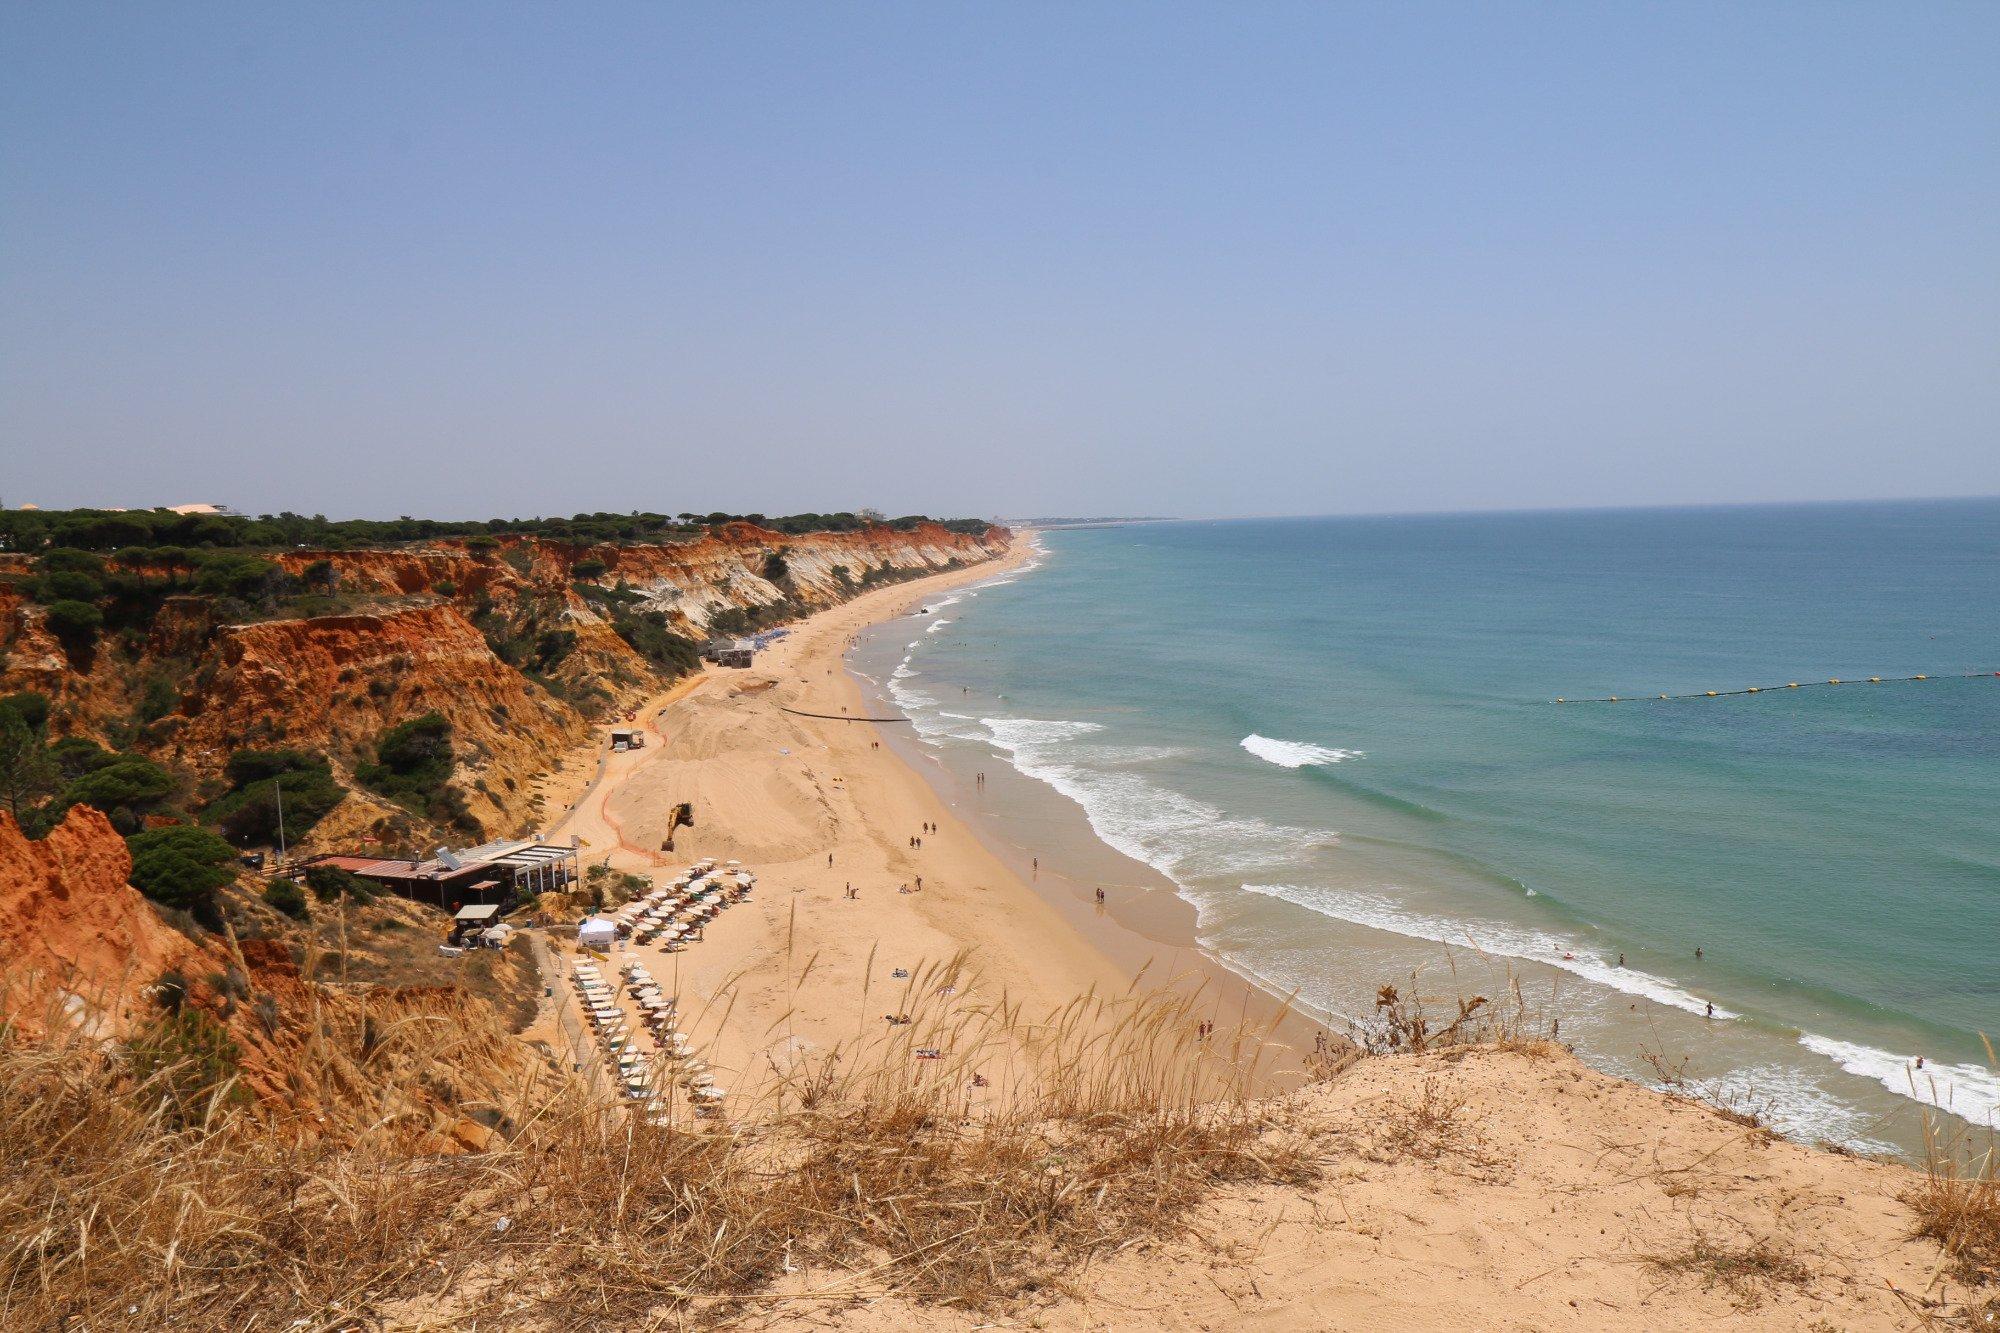 12- Praia da Falésia, Portugal